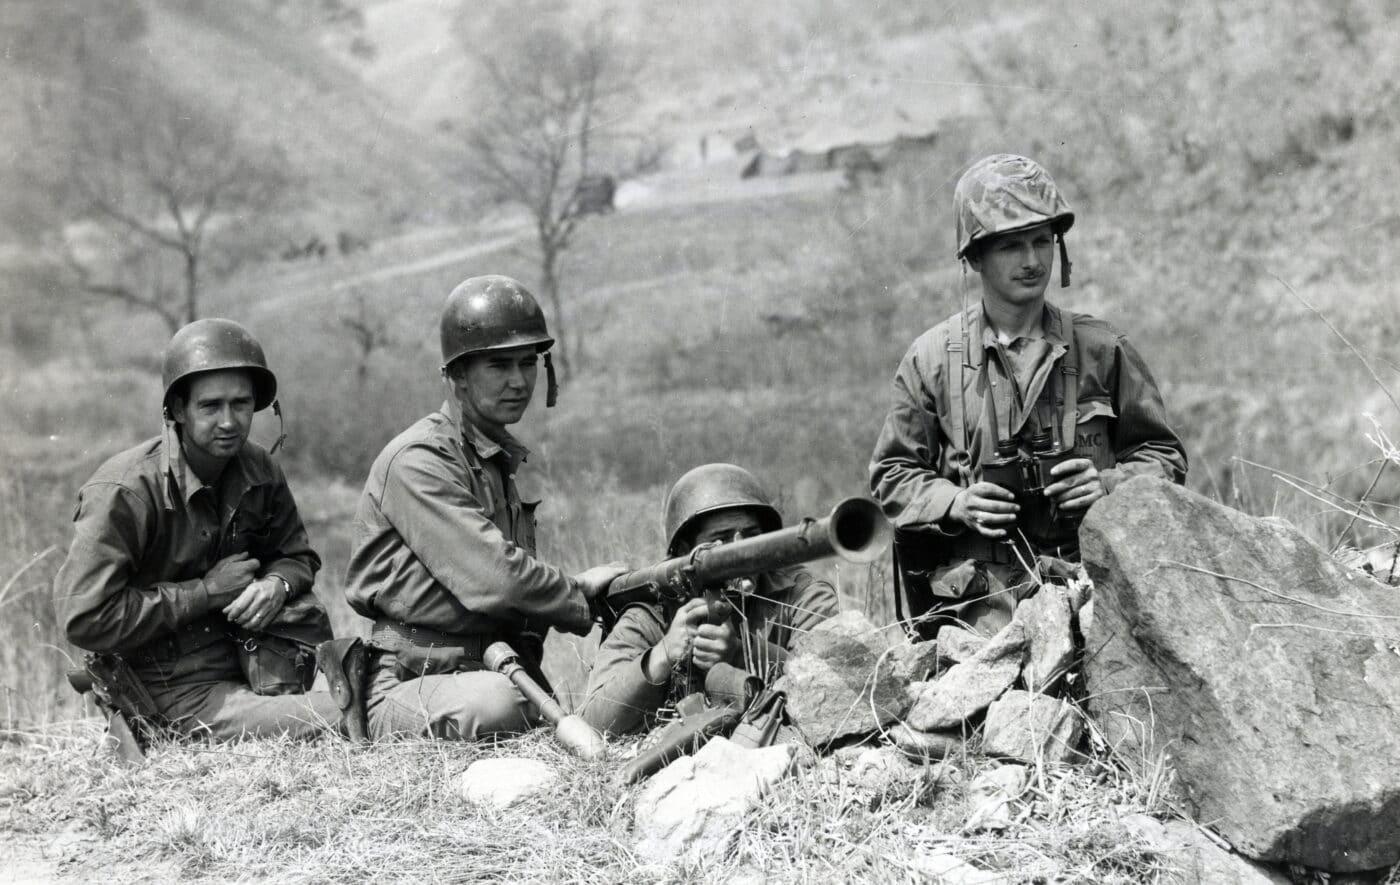 U.S. Marine bazooka team in the Korean War